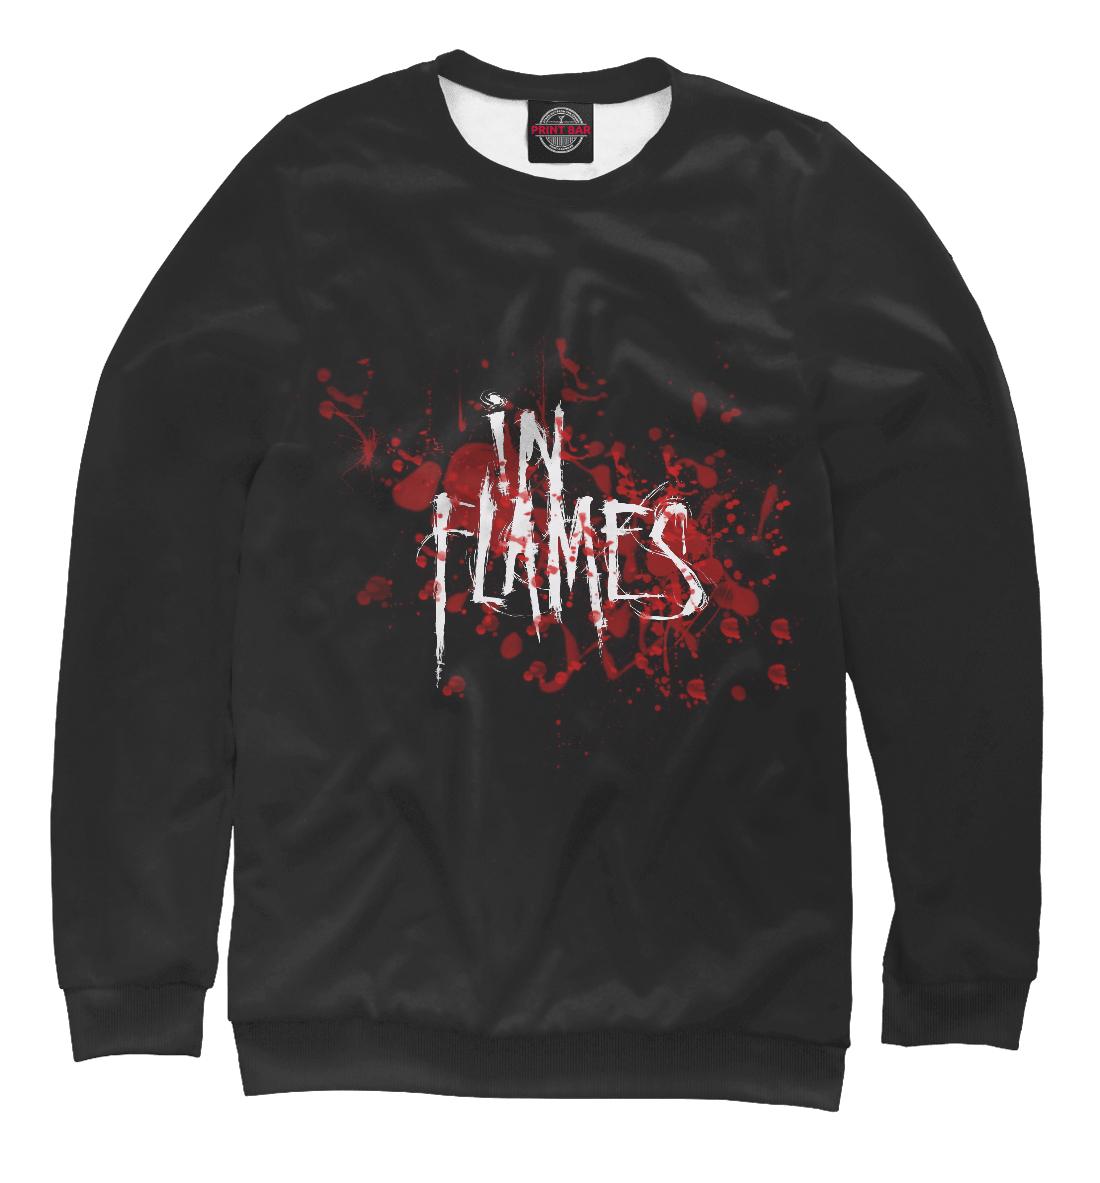 Купить In Flames, Printbar, Свитшоты, INF-923317-swi-1